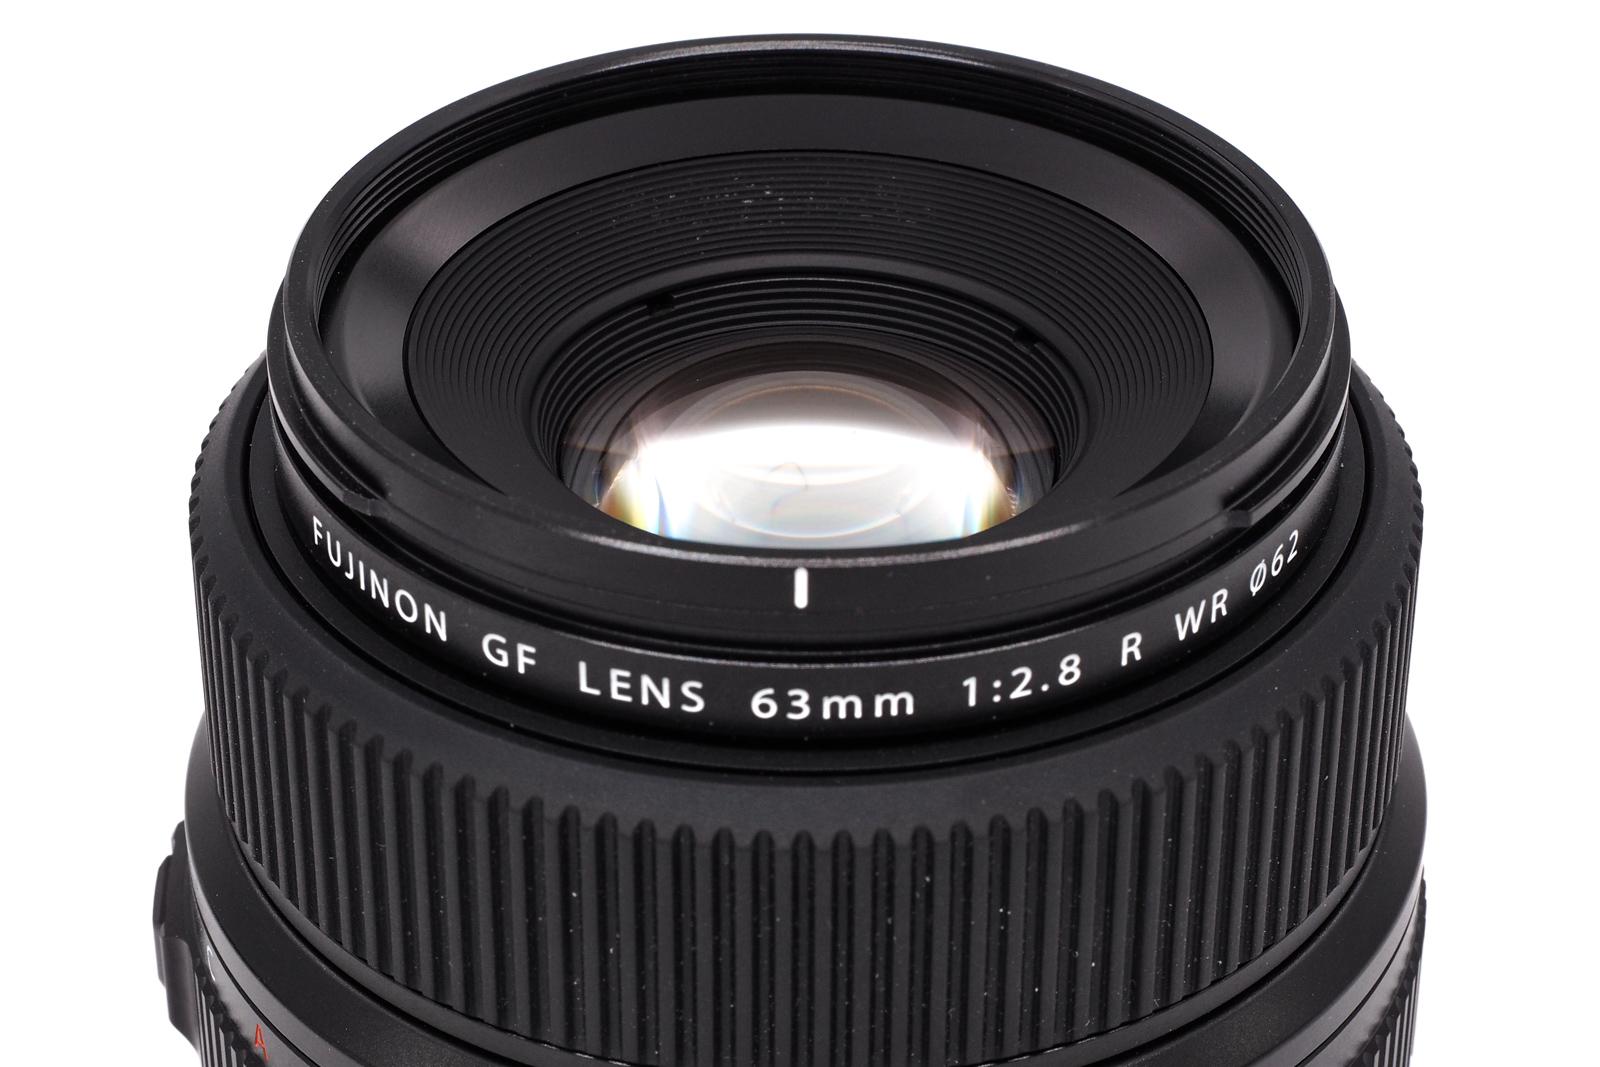 Fujifilm Fujinon GF 63mm F2.8